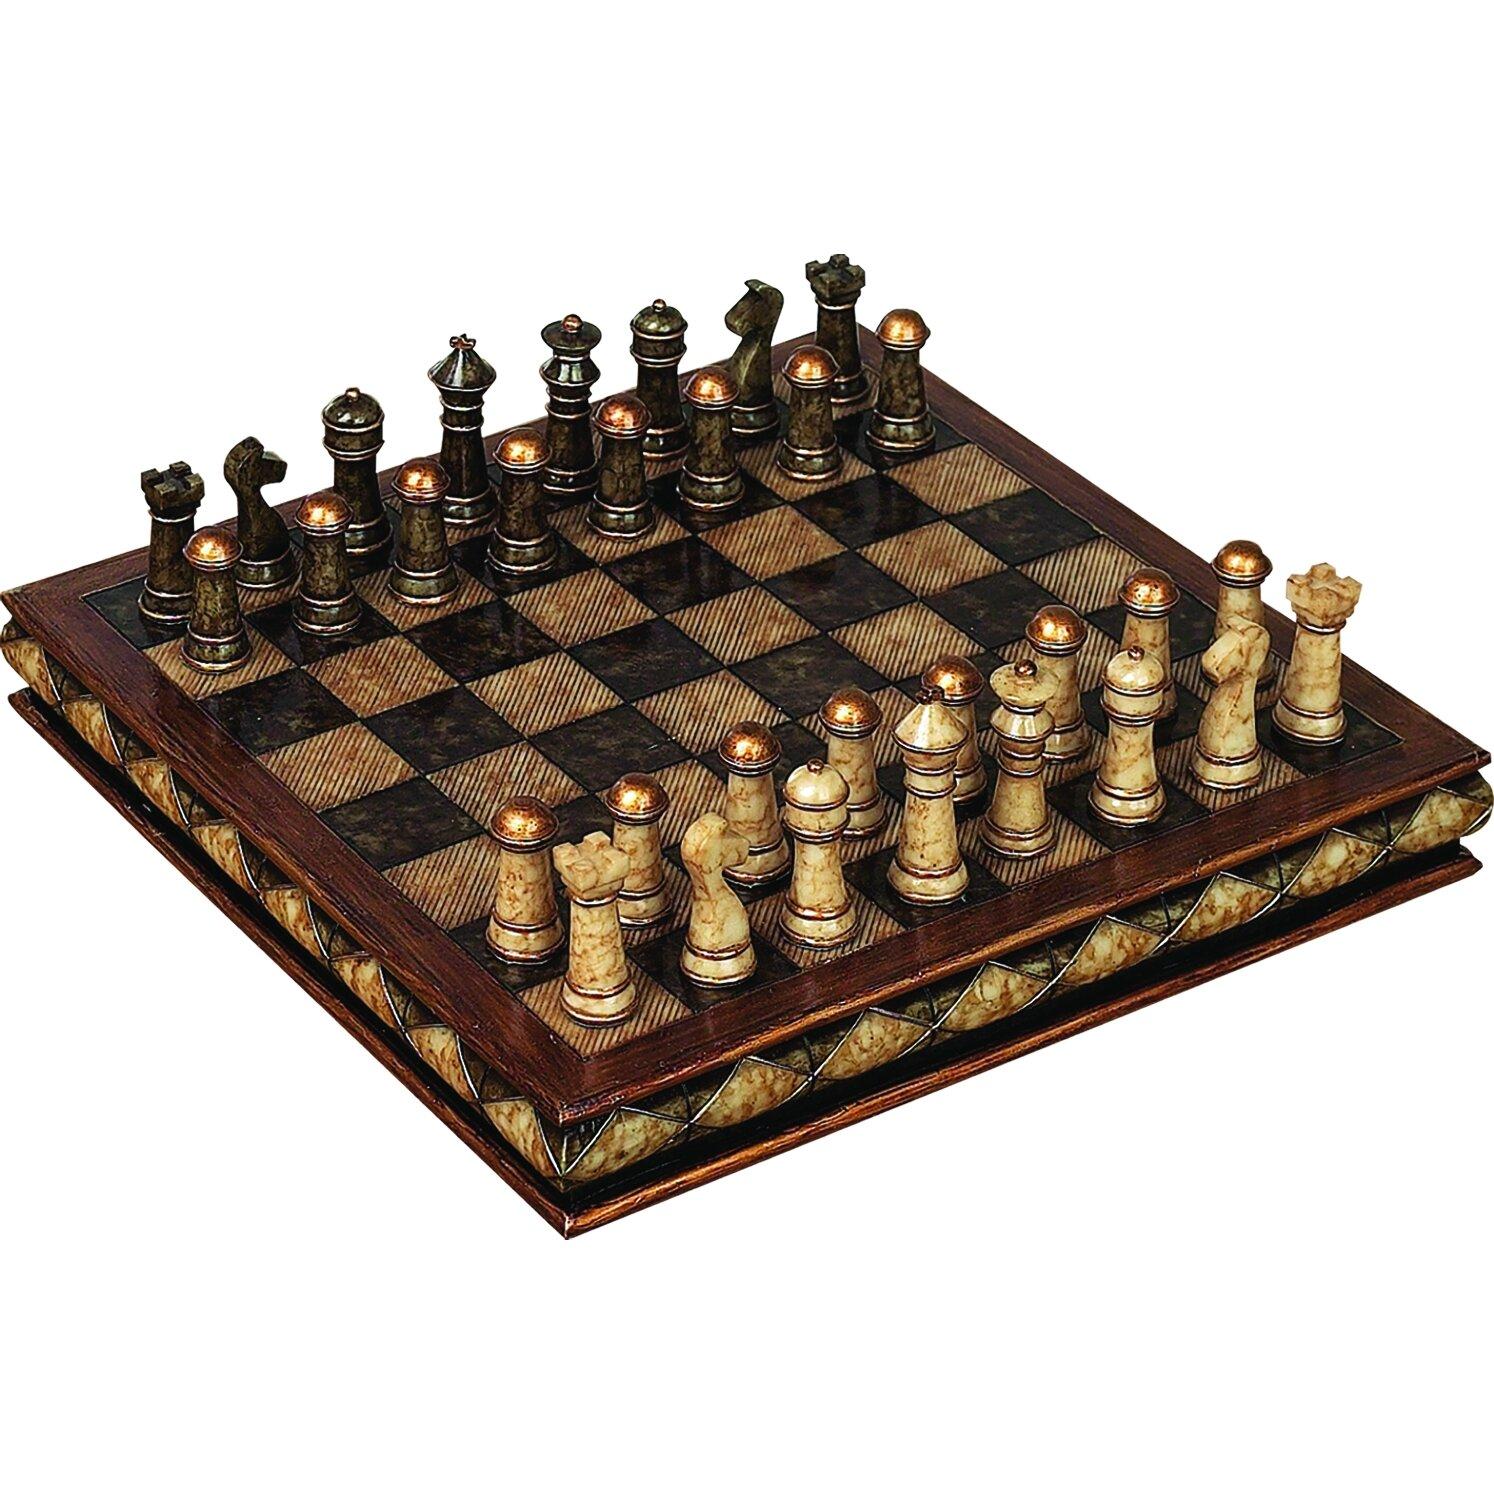 Astoria grand fiarmont decorative chess set reviews wayfair - Ornamental chess sets ...